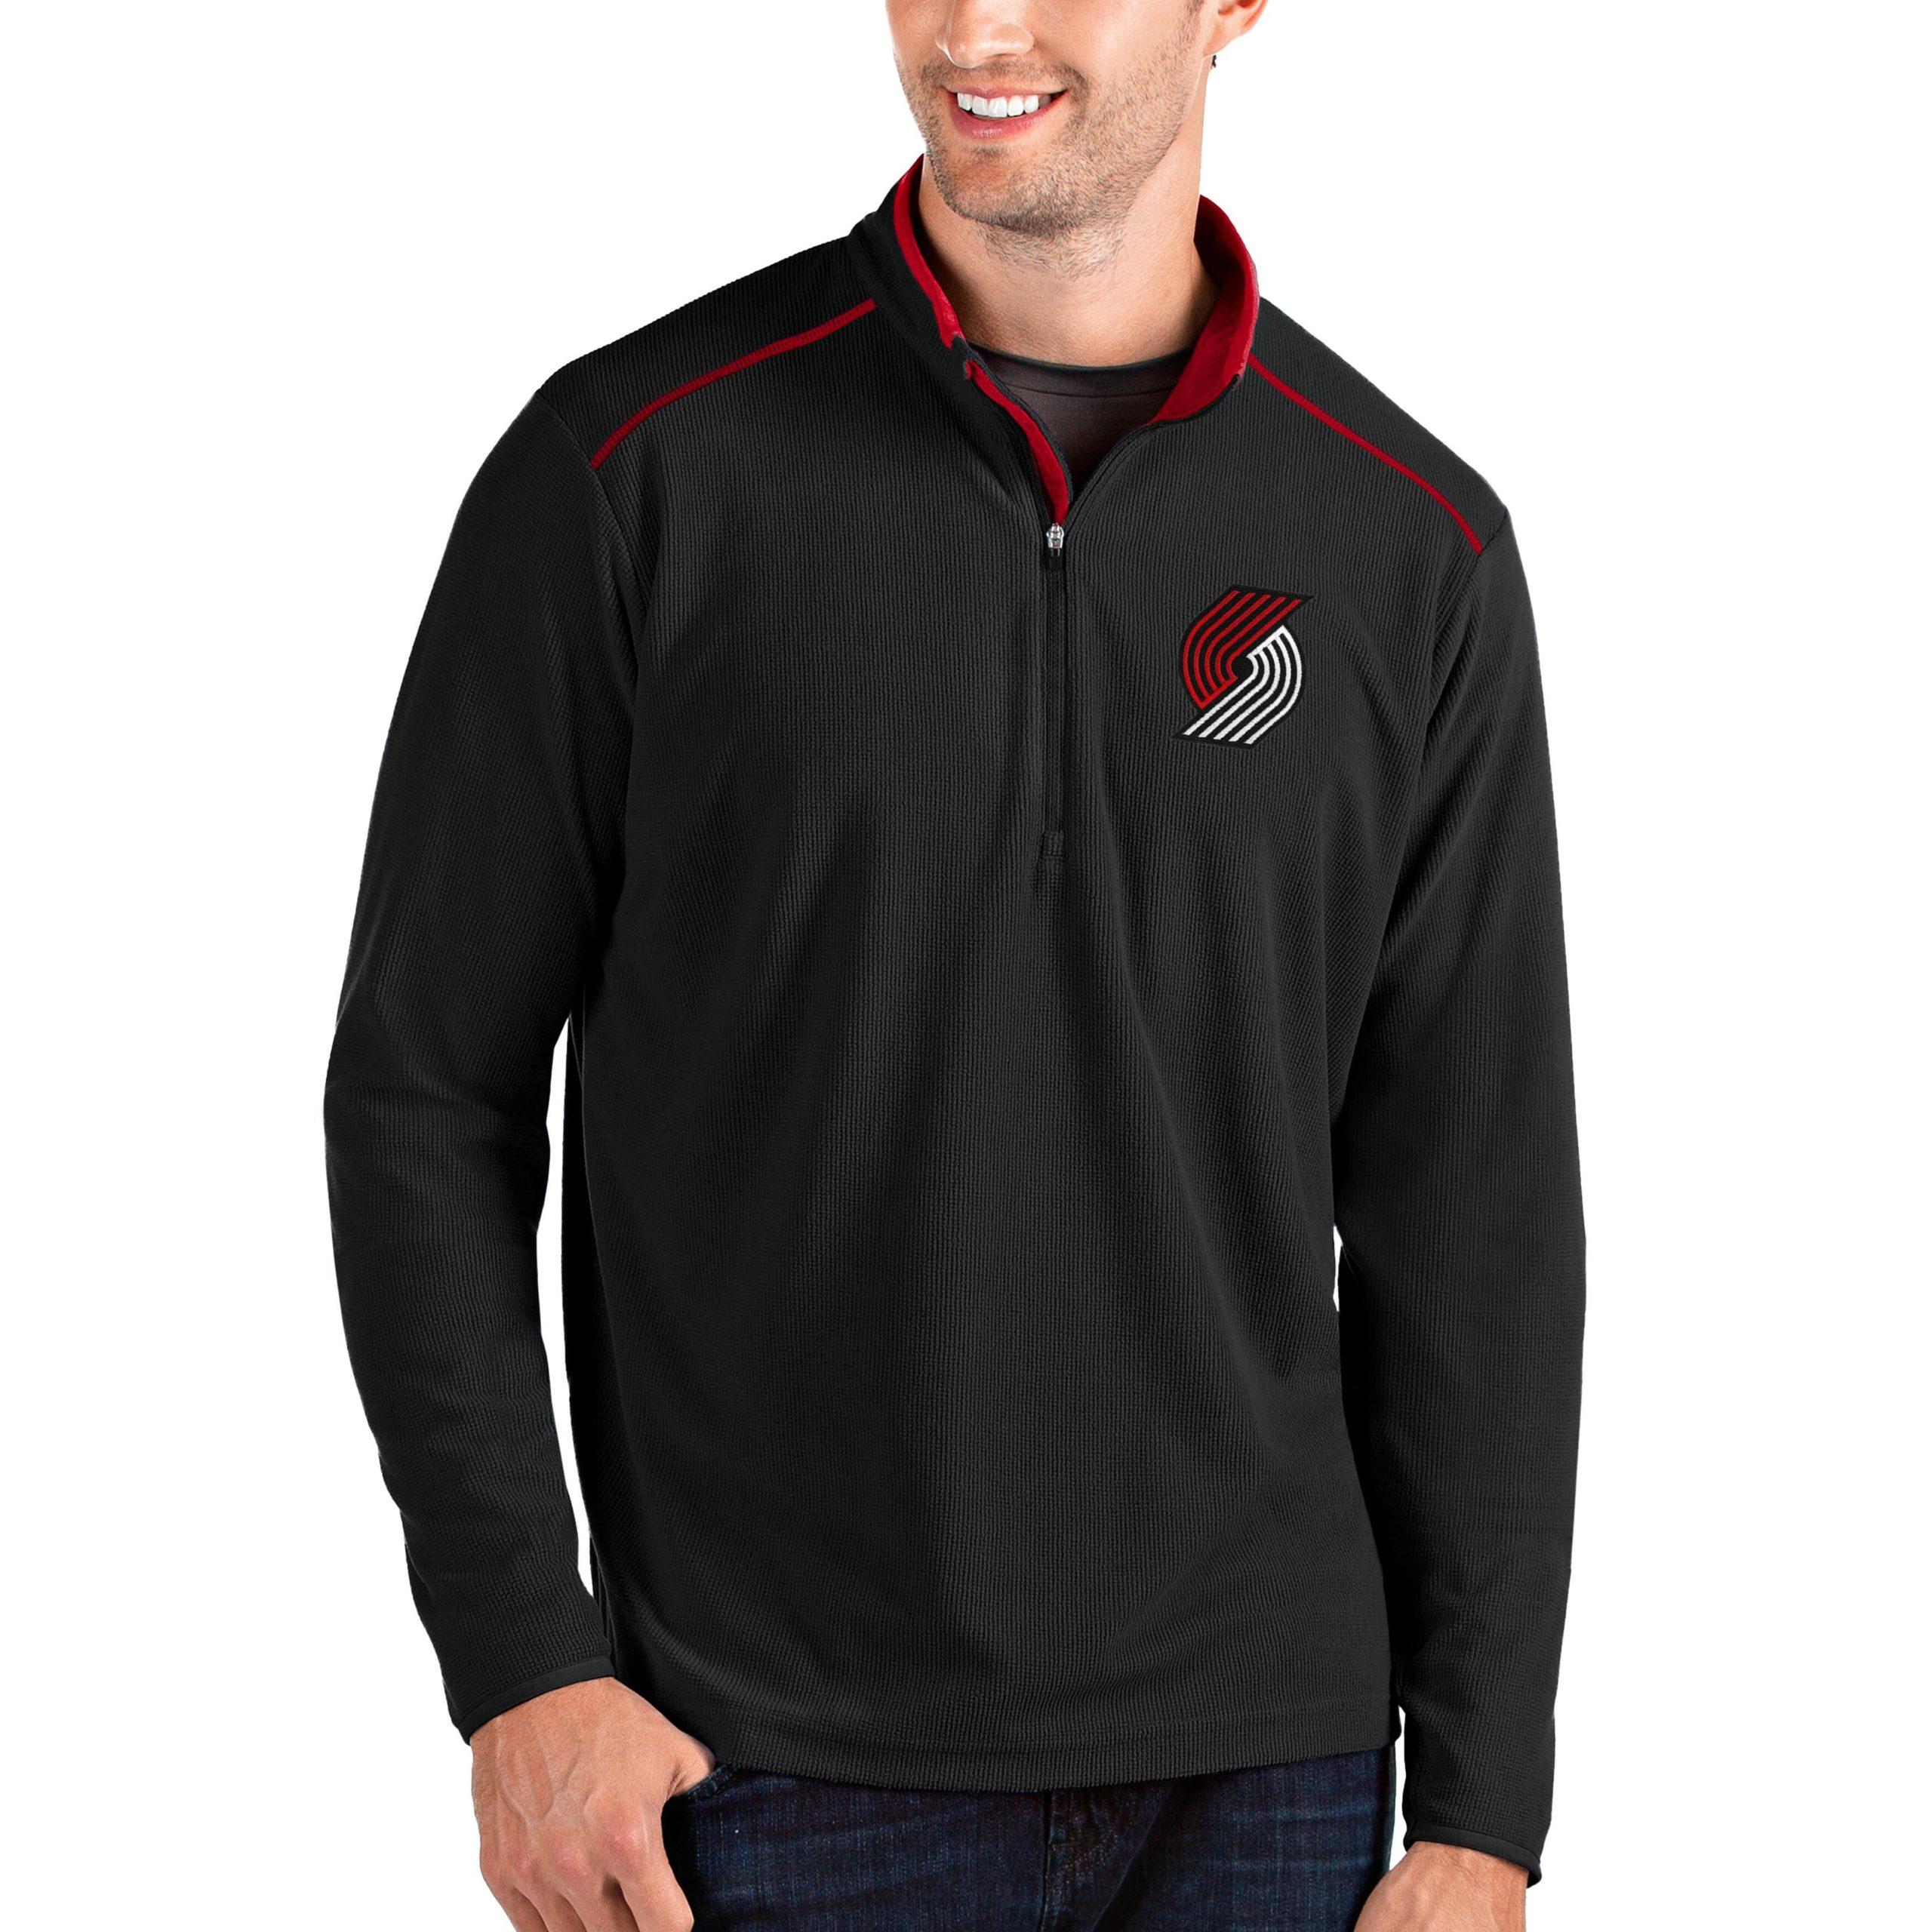 Portland Trail Blazers Antigua Big & Tall Glacier Quarter-Zip Pullover Jacket - Black/Red